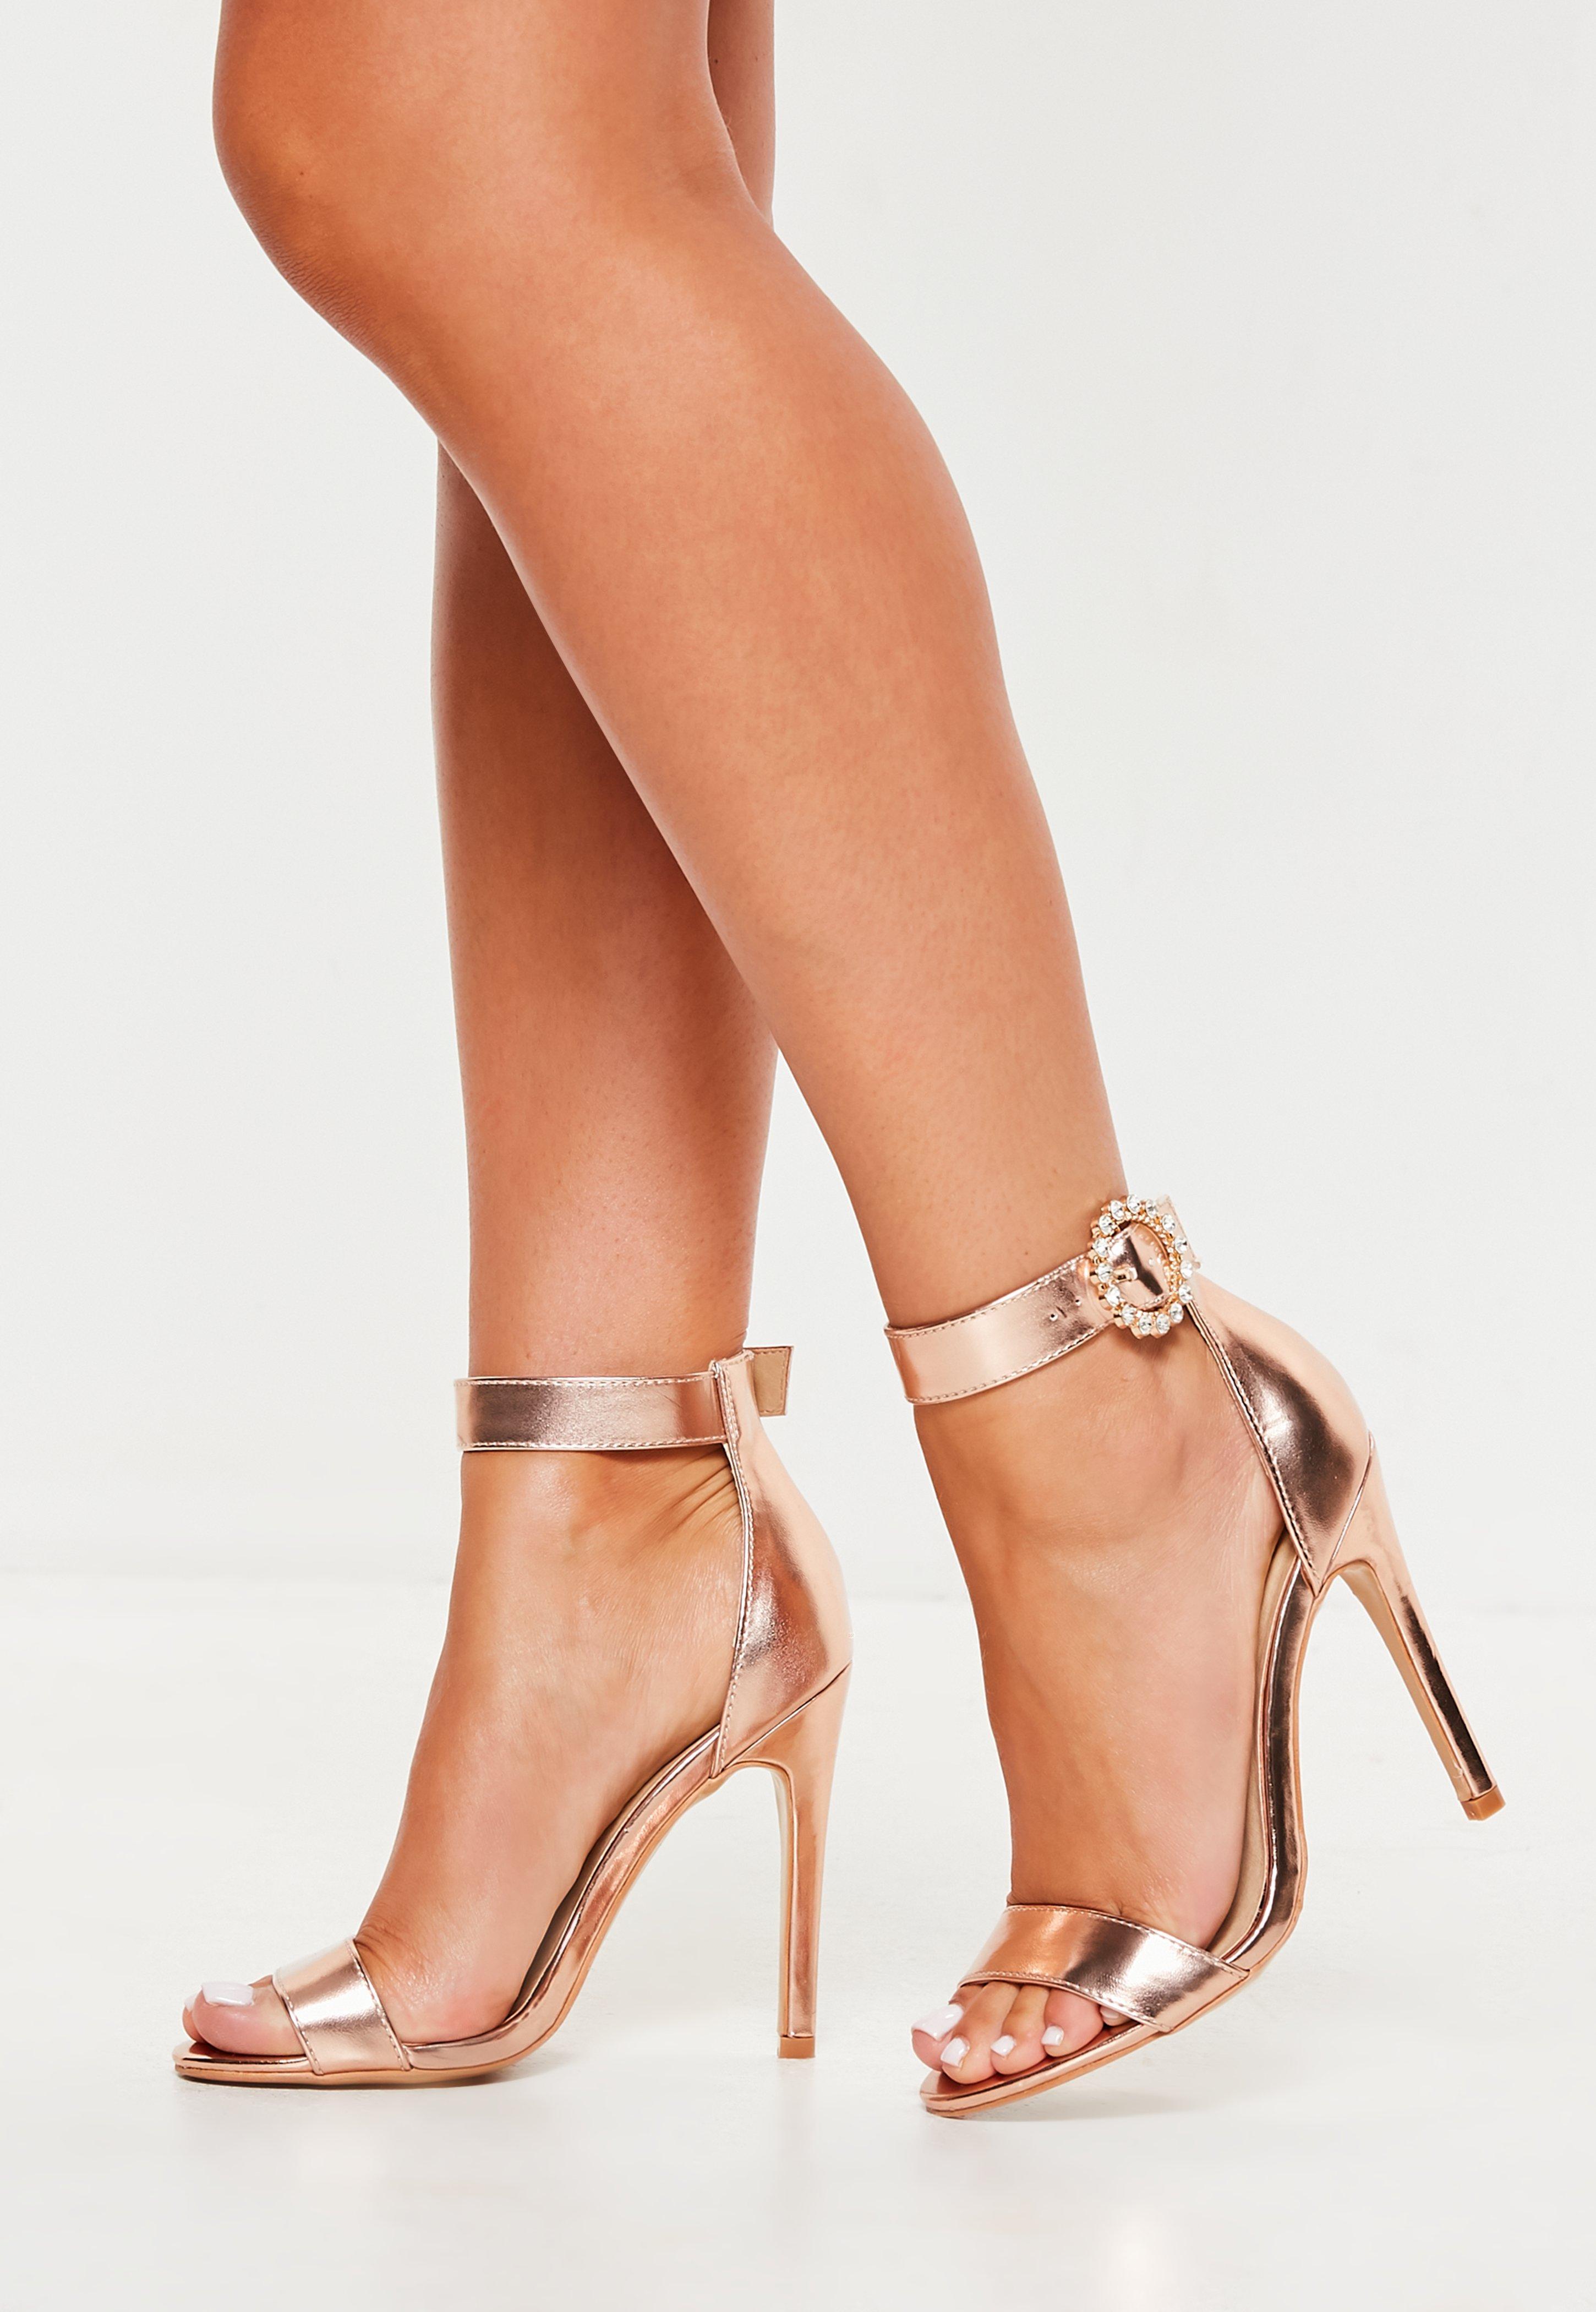 e093a15006e6 Navy blue denim knee high sandal boots women front cross-tied lace up high  heels gladiator ...